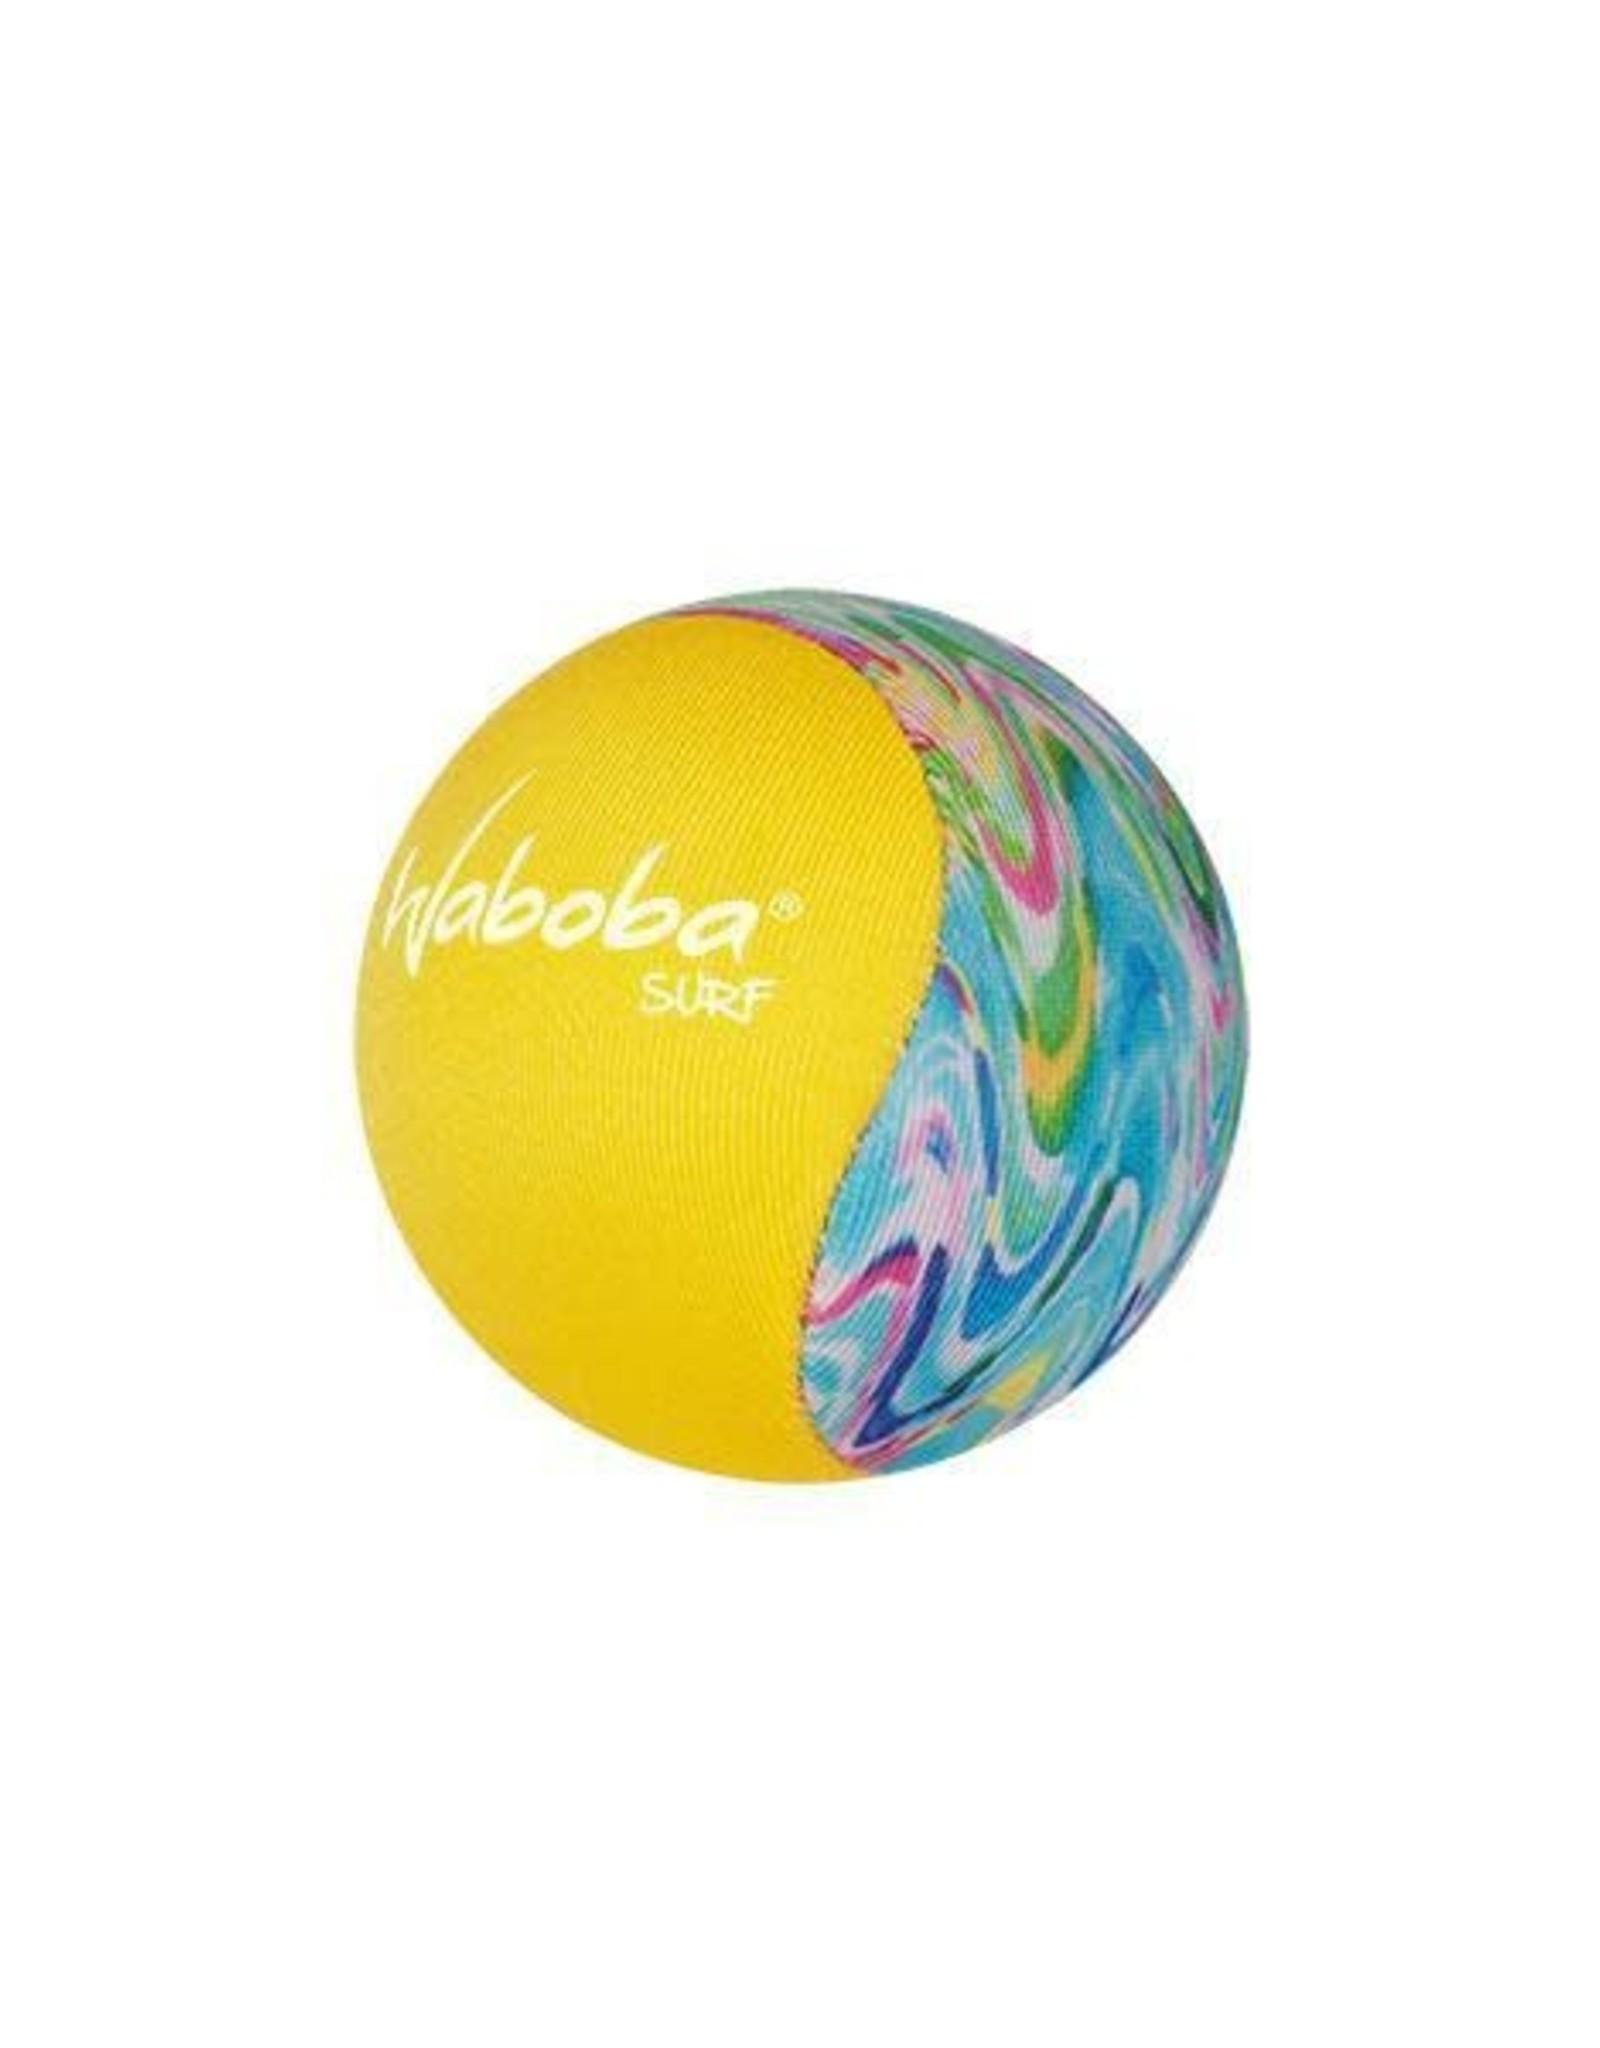 Waboba Surf Ball, Sunny Waves